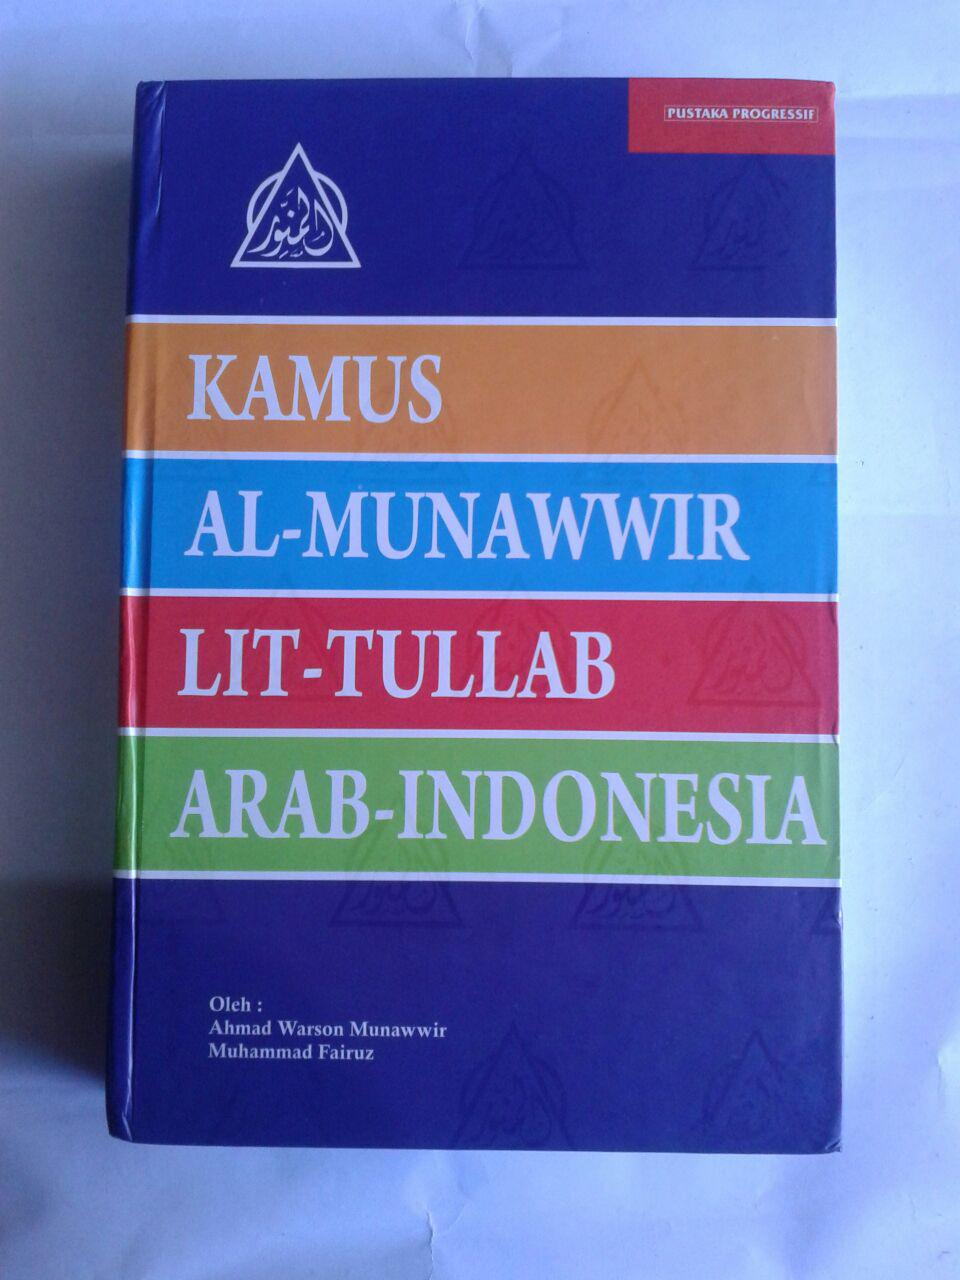 Buku Kamus Al-Munawwir Lit-Tullab Arab-Indonesia cover 3